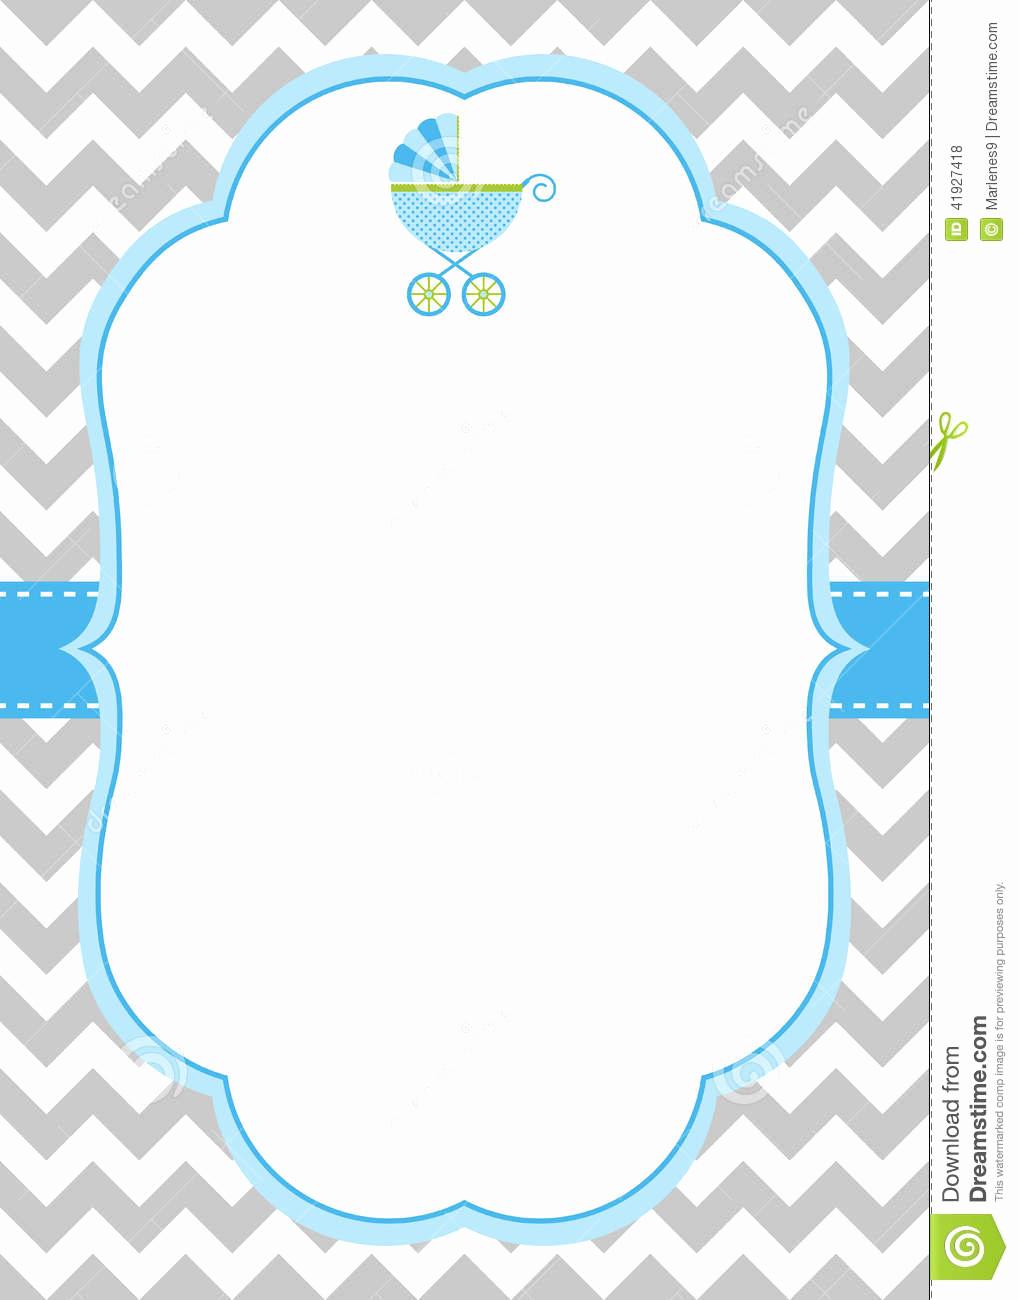 Baby Shower Invitation Border Elegant Baby Boy Invitation Card Stock Vector Illustration Of